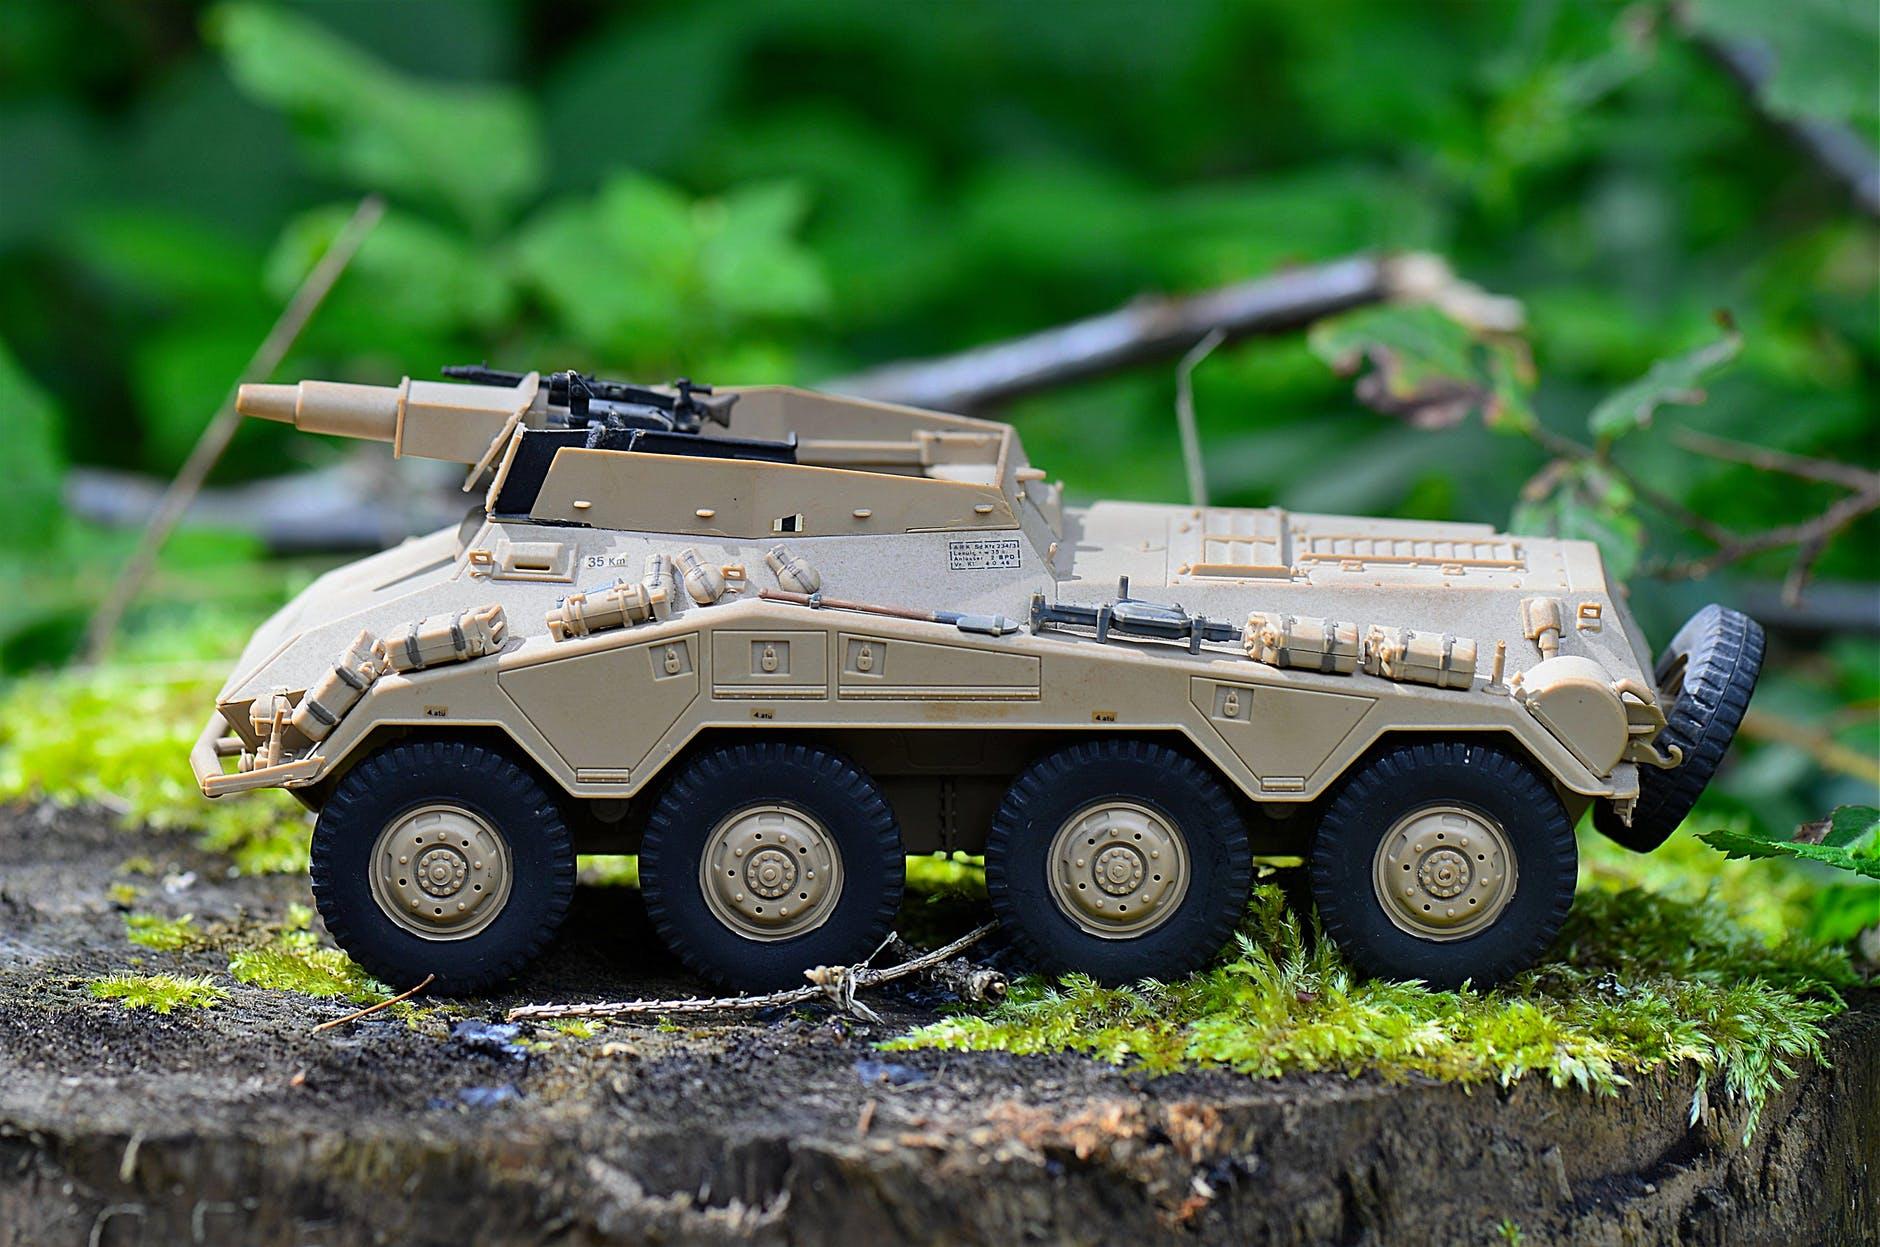 radpanzer-model-military-vehicle-163546.jpeg